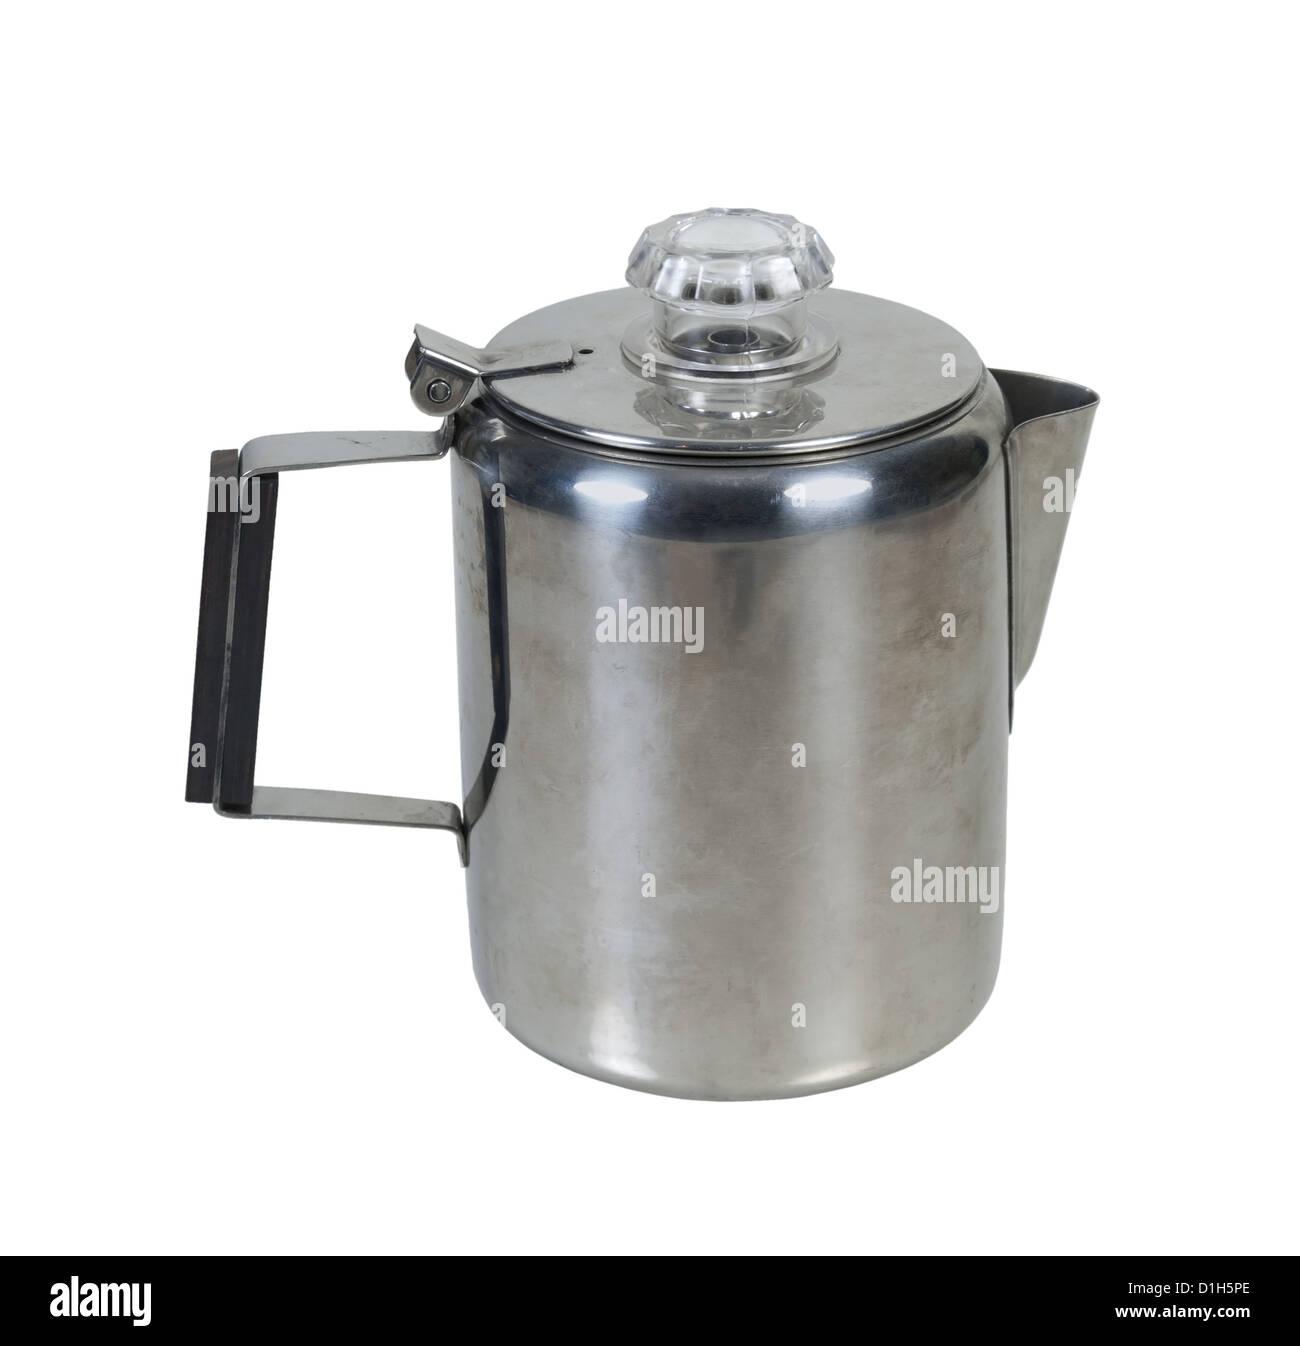 Retro perculator coffee pot for making coffee - path included - Stock Image